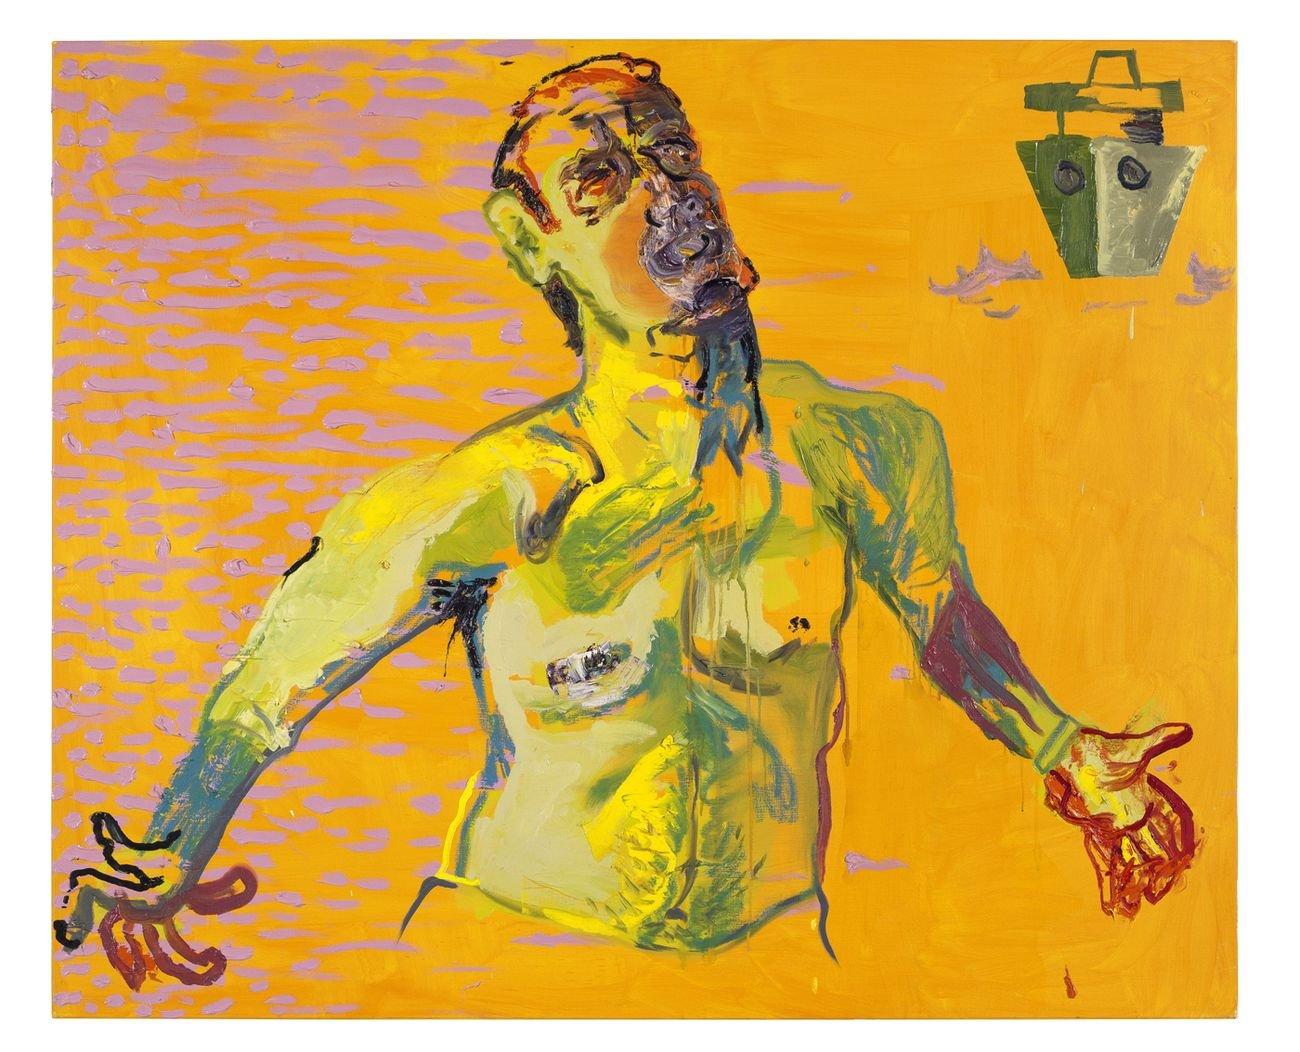 Martin Kippenberger, Ohne Titel (aus der Serie Das Floß der Medusa), 1996 © Estate of Martin Kippenberger, Galerie Gisela Capitain, Colonia